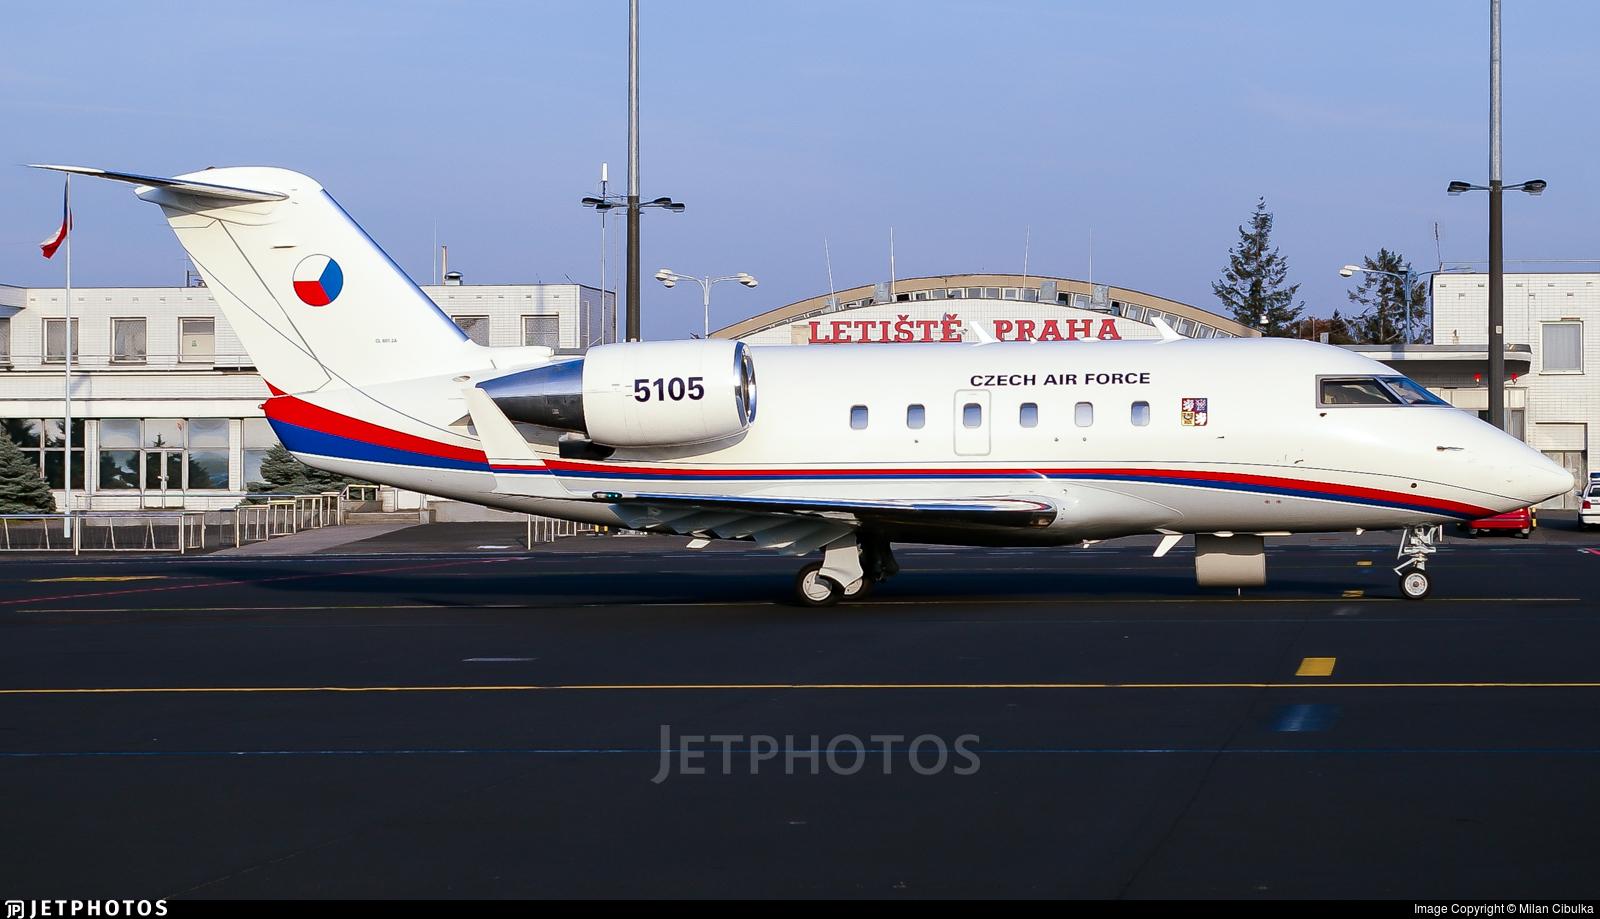 5105 - Bombardier CL-600-2B16 Challenger 601-3A - Czech Republic - Air Force